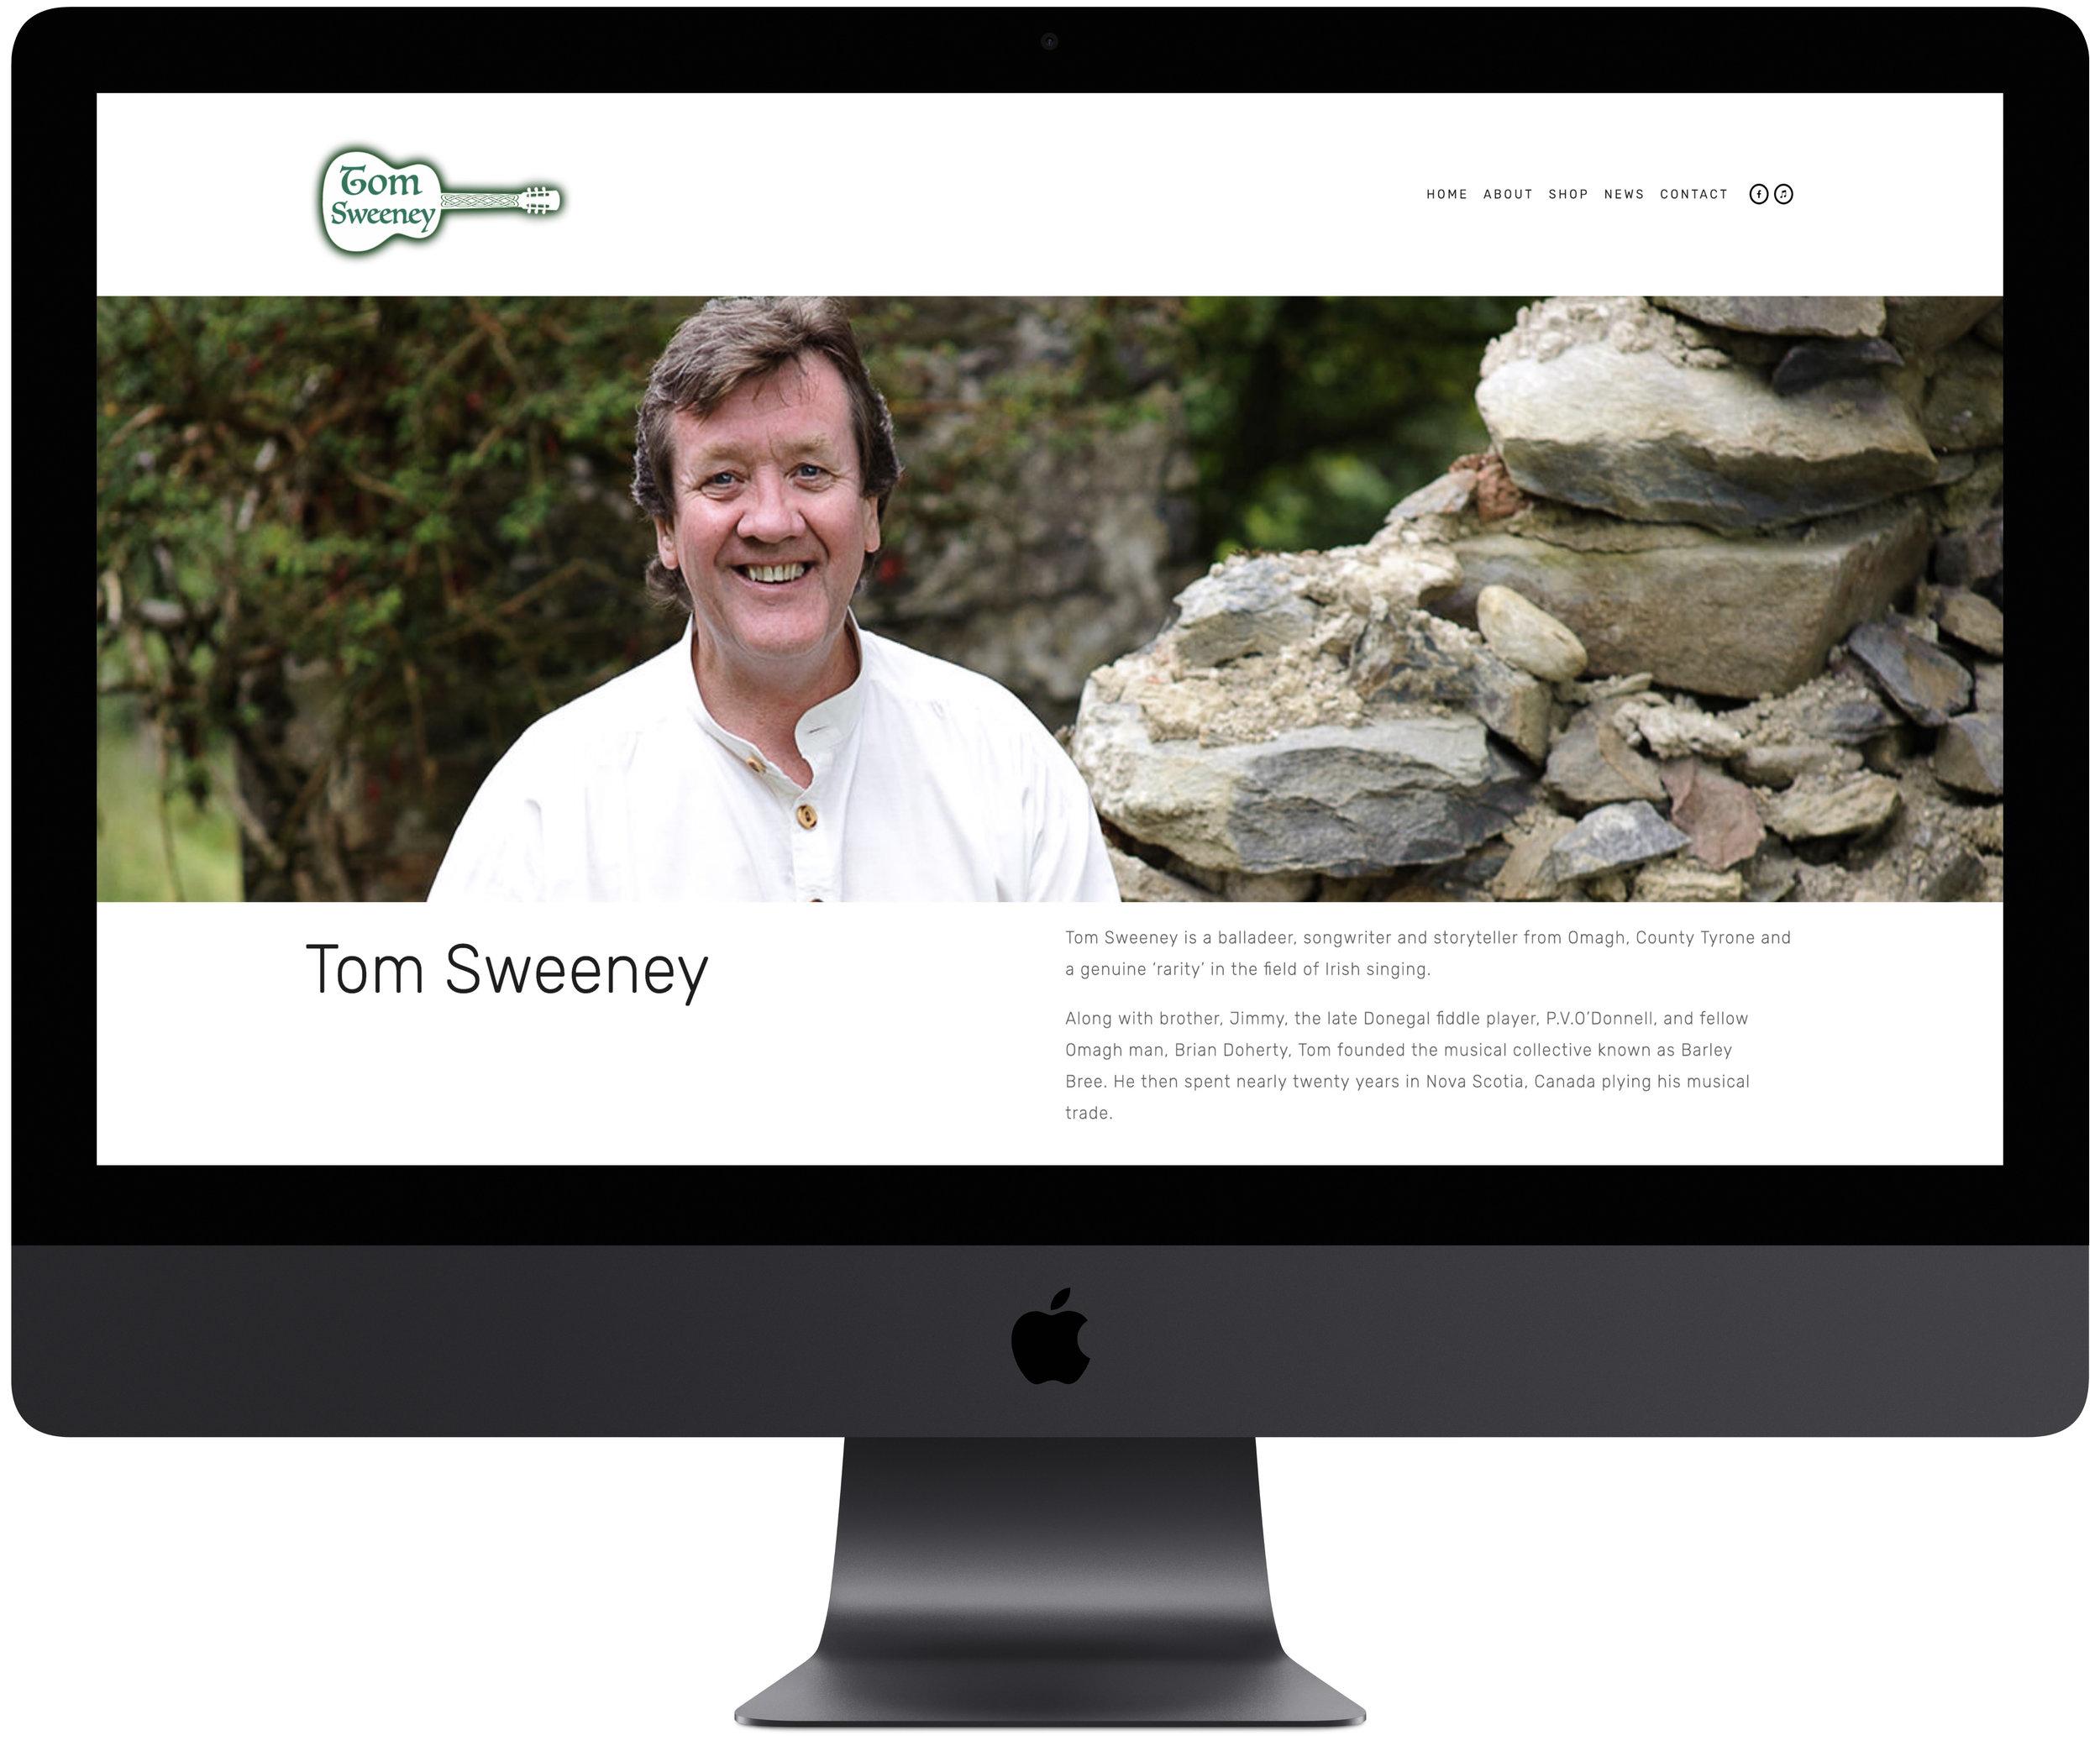 Tom Sweeney iMac Pro.jpg